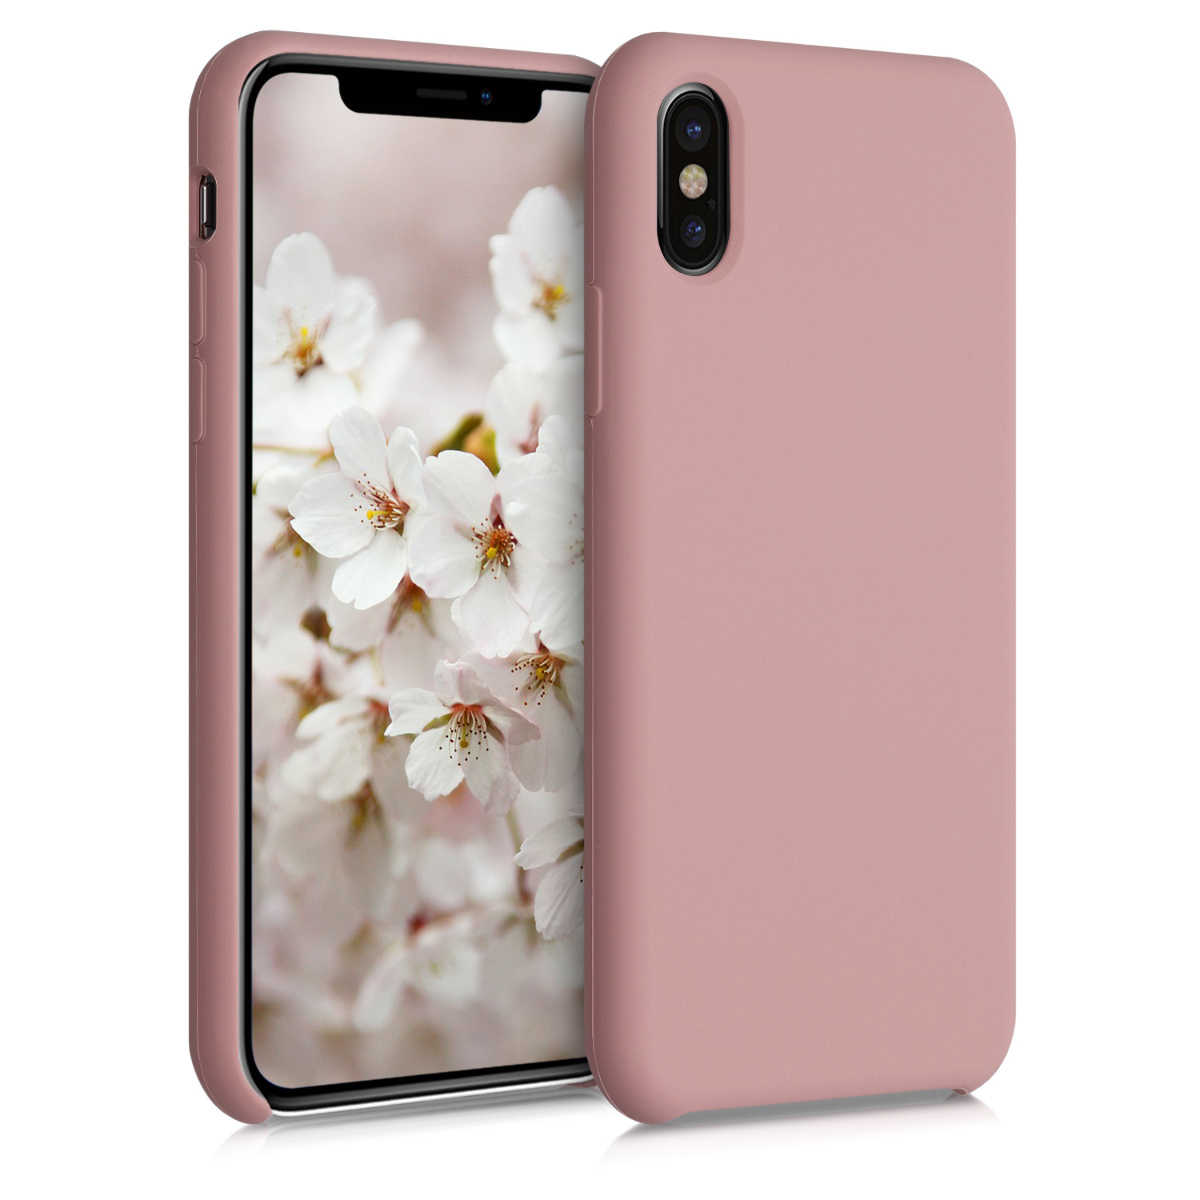 Kvalitní silikonové TPU pouzdro pro Apple iPhone X - Rose Tan